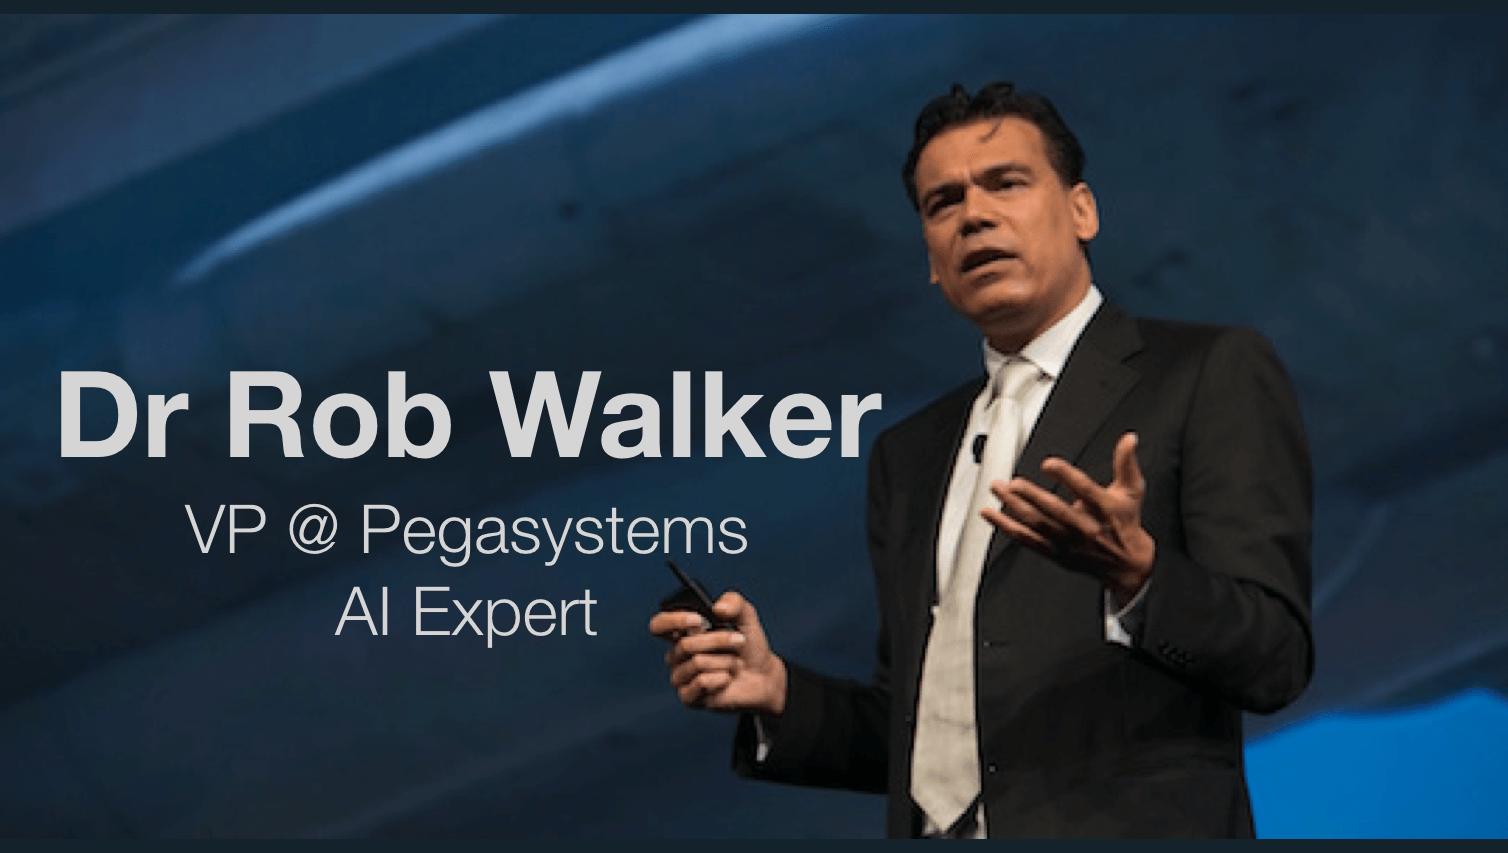 Dr Rob Walker Pegasystems